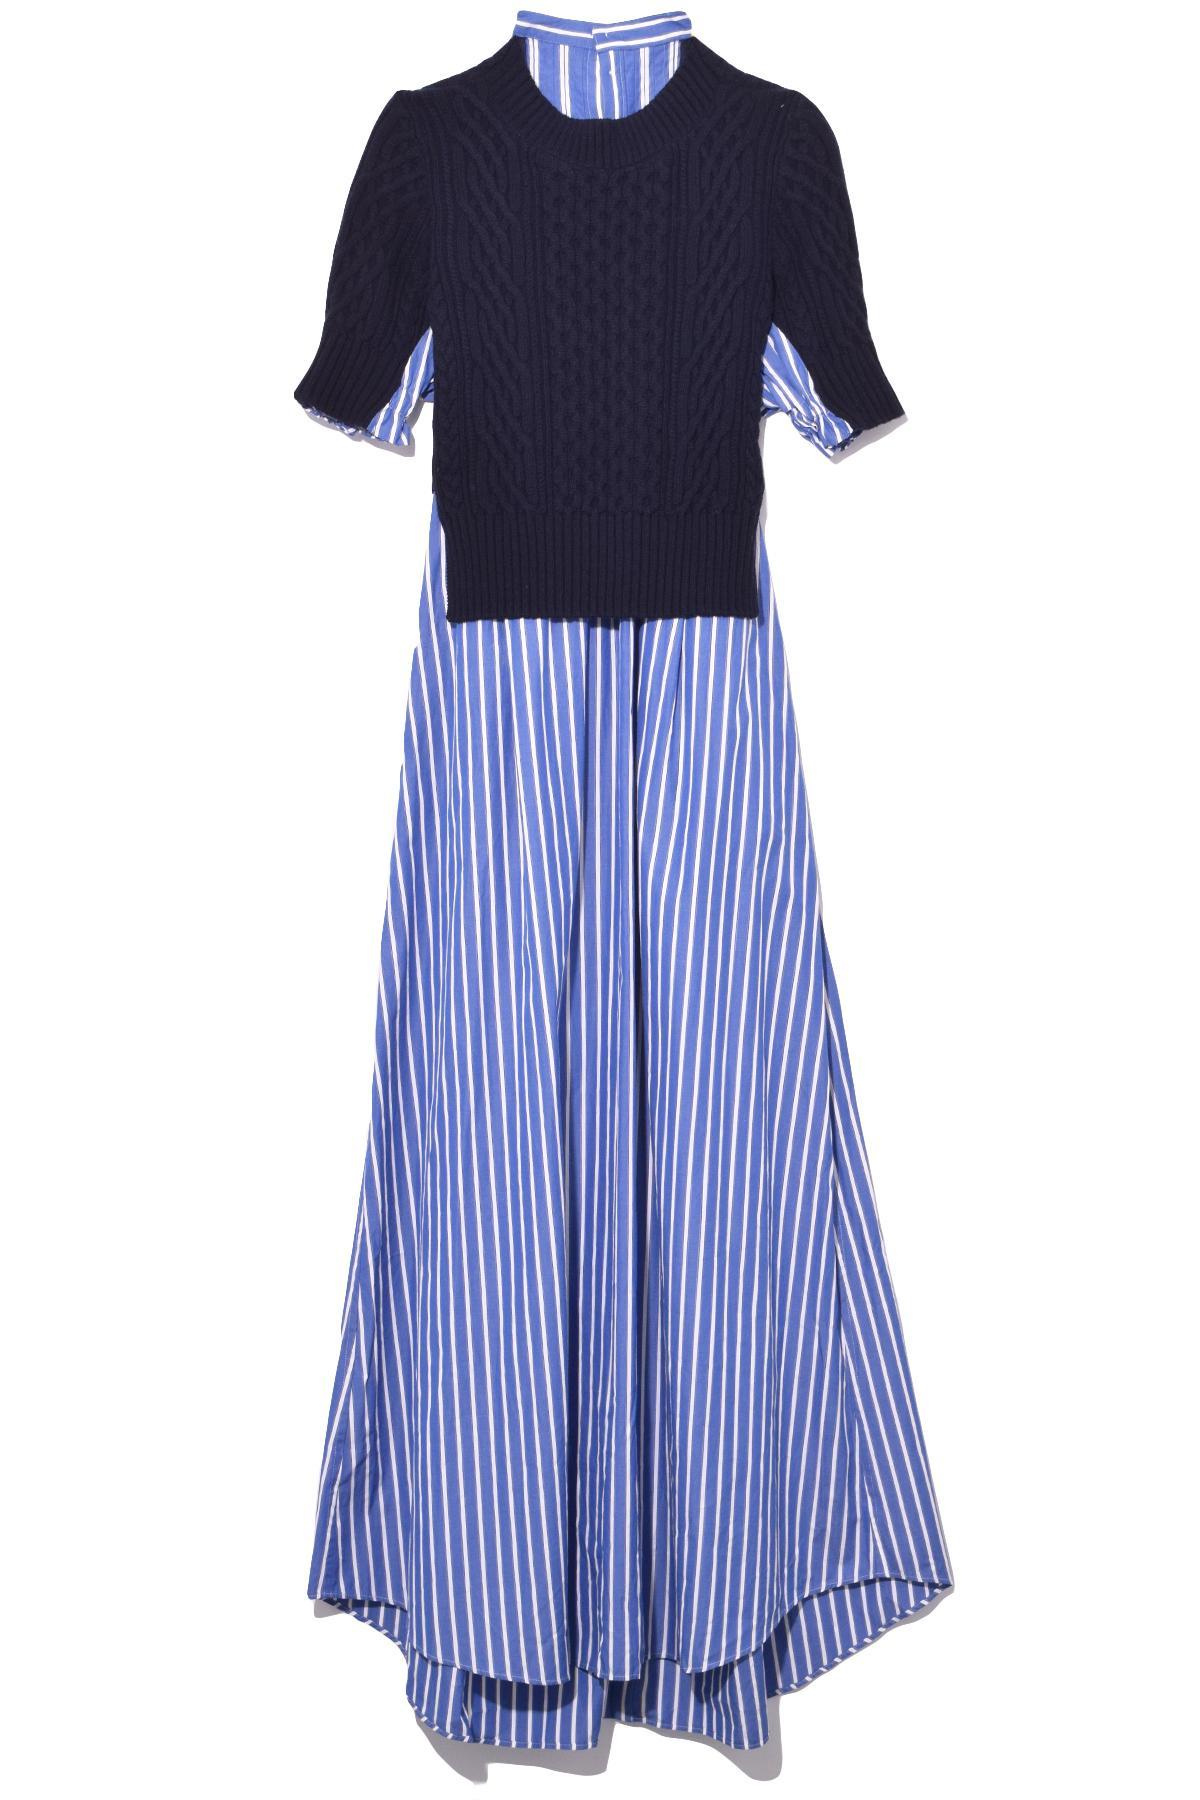 c74c184dfff Sacai Long Striped Dress in Blue - Lyst